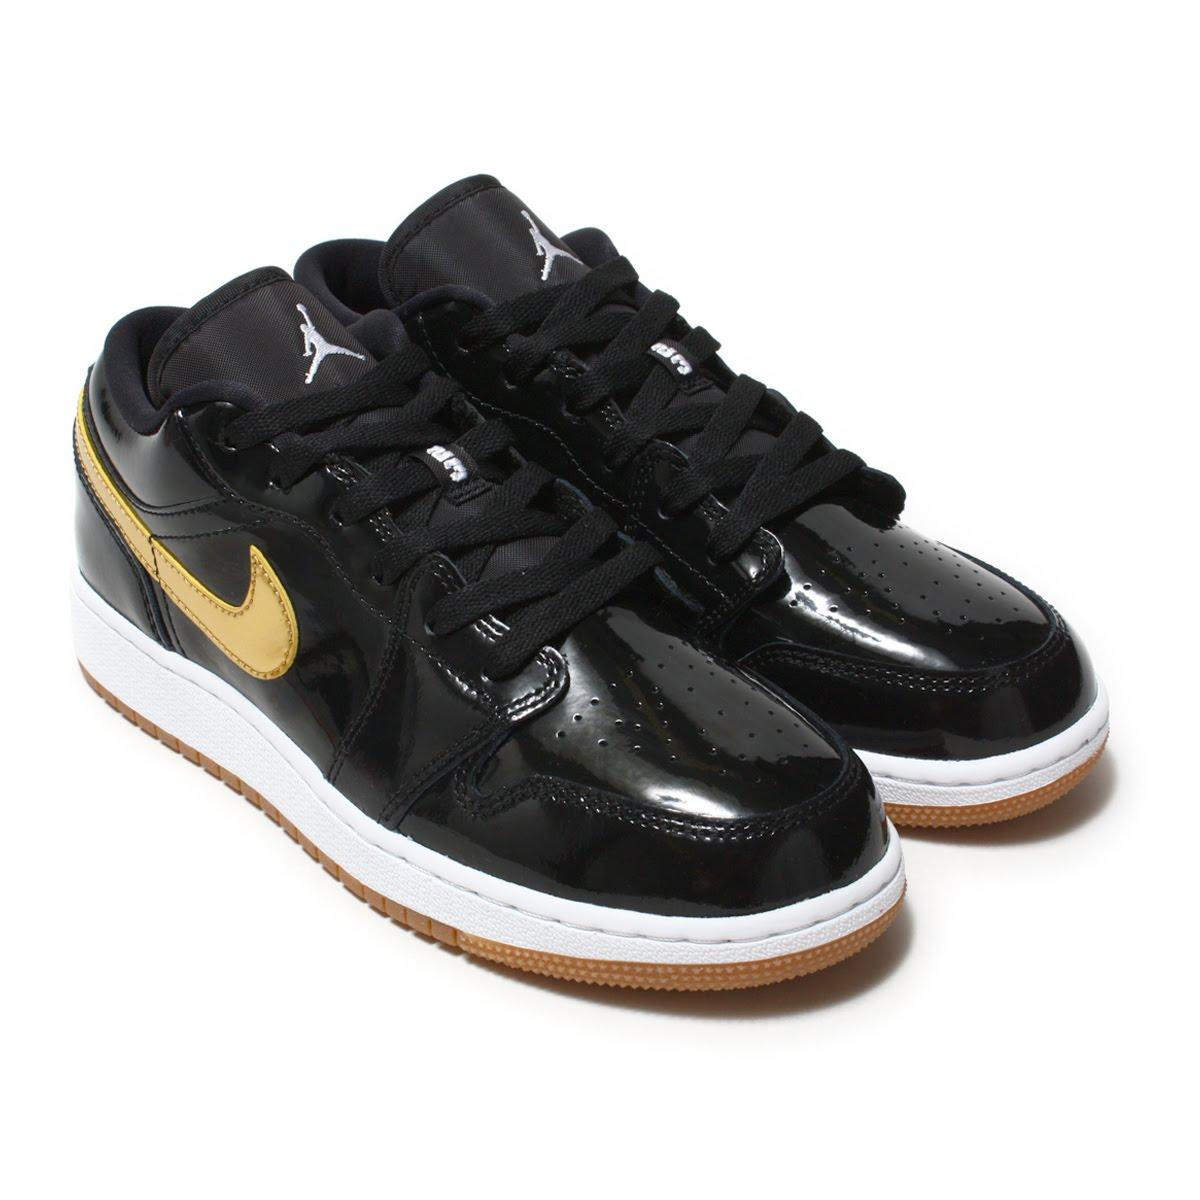 a8fab4b64d95 NIKE AIR JORDAN 1 LOW GG (Nike Air Jordan 1 low GG) BLACK METALLIC GOLD-WHITE  18SP-I